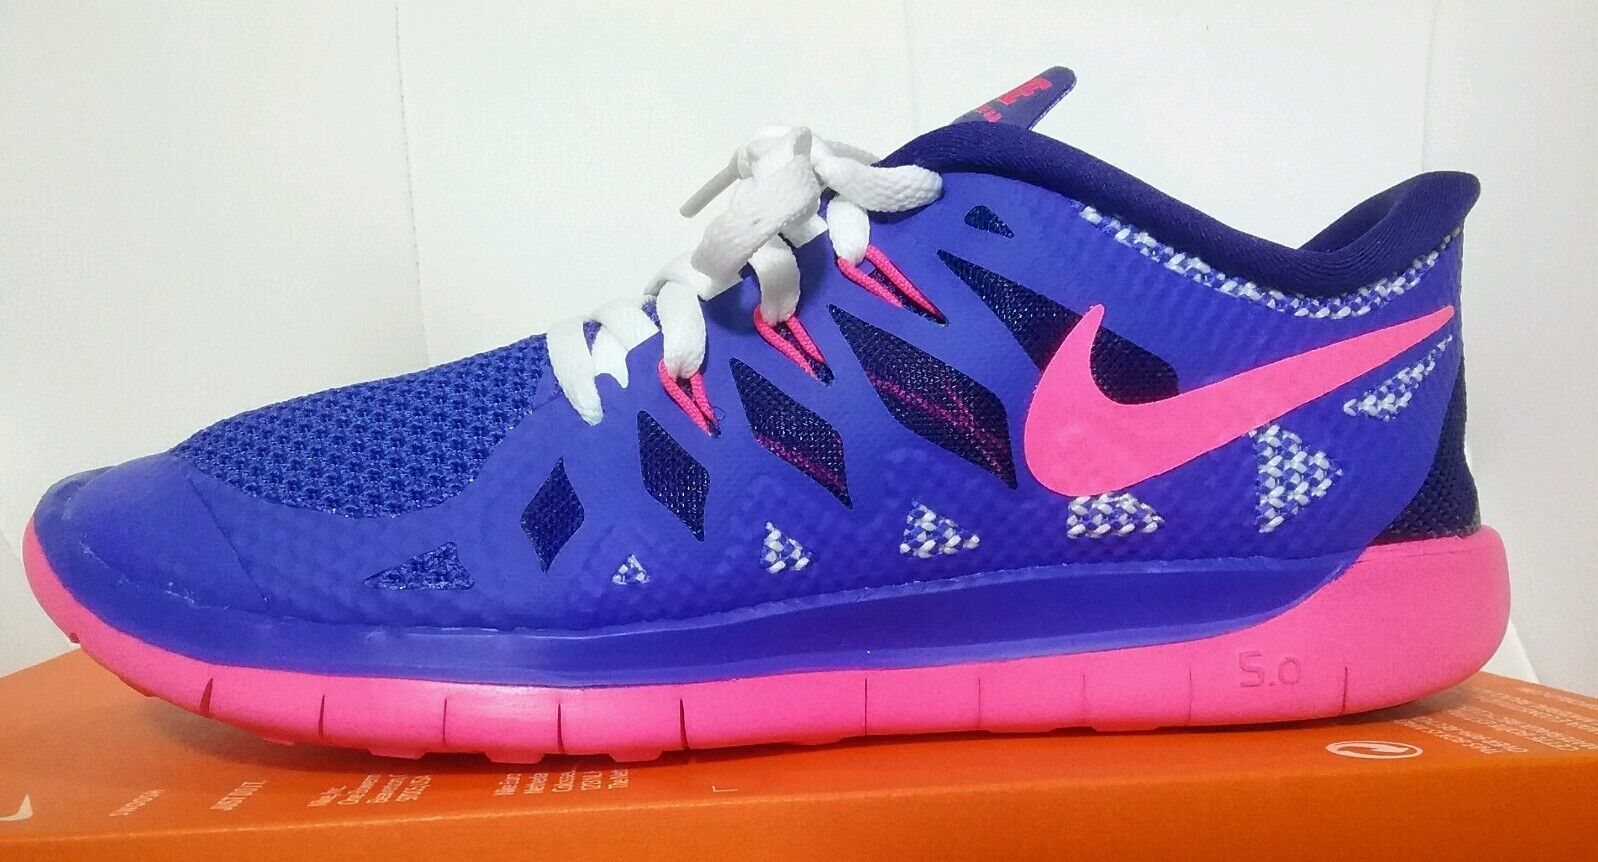 Nike free 5.0 GS Training Lauf schuhe Schuhe Jogging Turnschuhe Fitness schuhe Neu Das hochwertigste Material